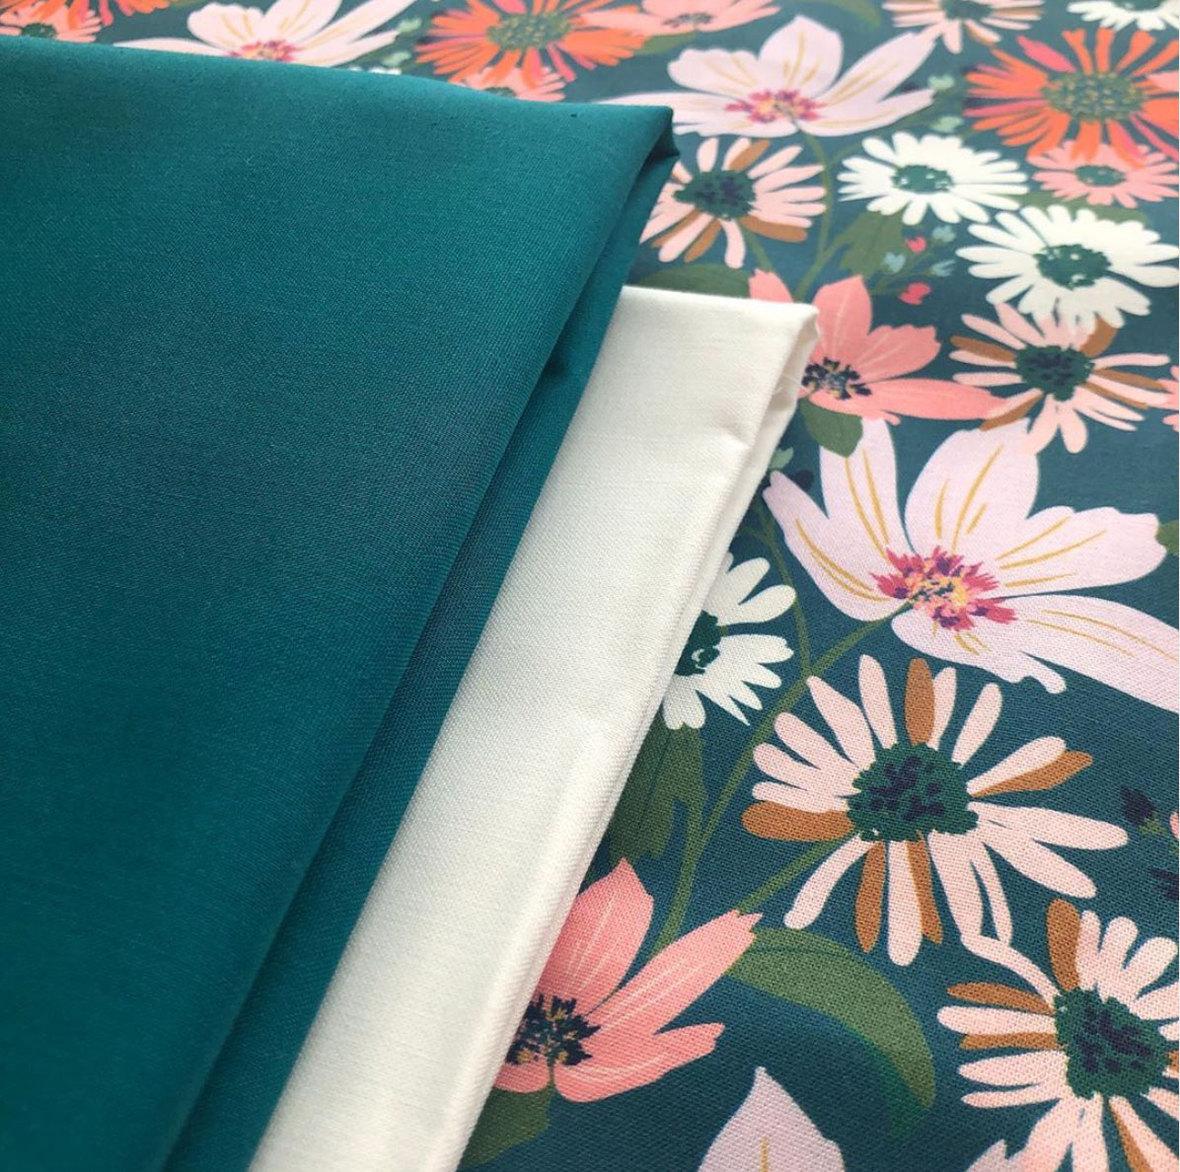 Bunny Garden Teresa Chan and Hawthorne Fabric homecoming quilt along